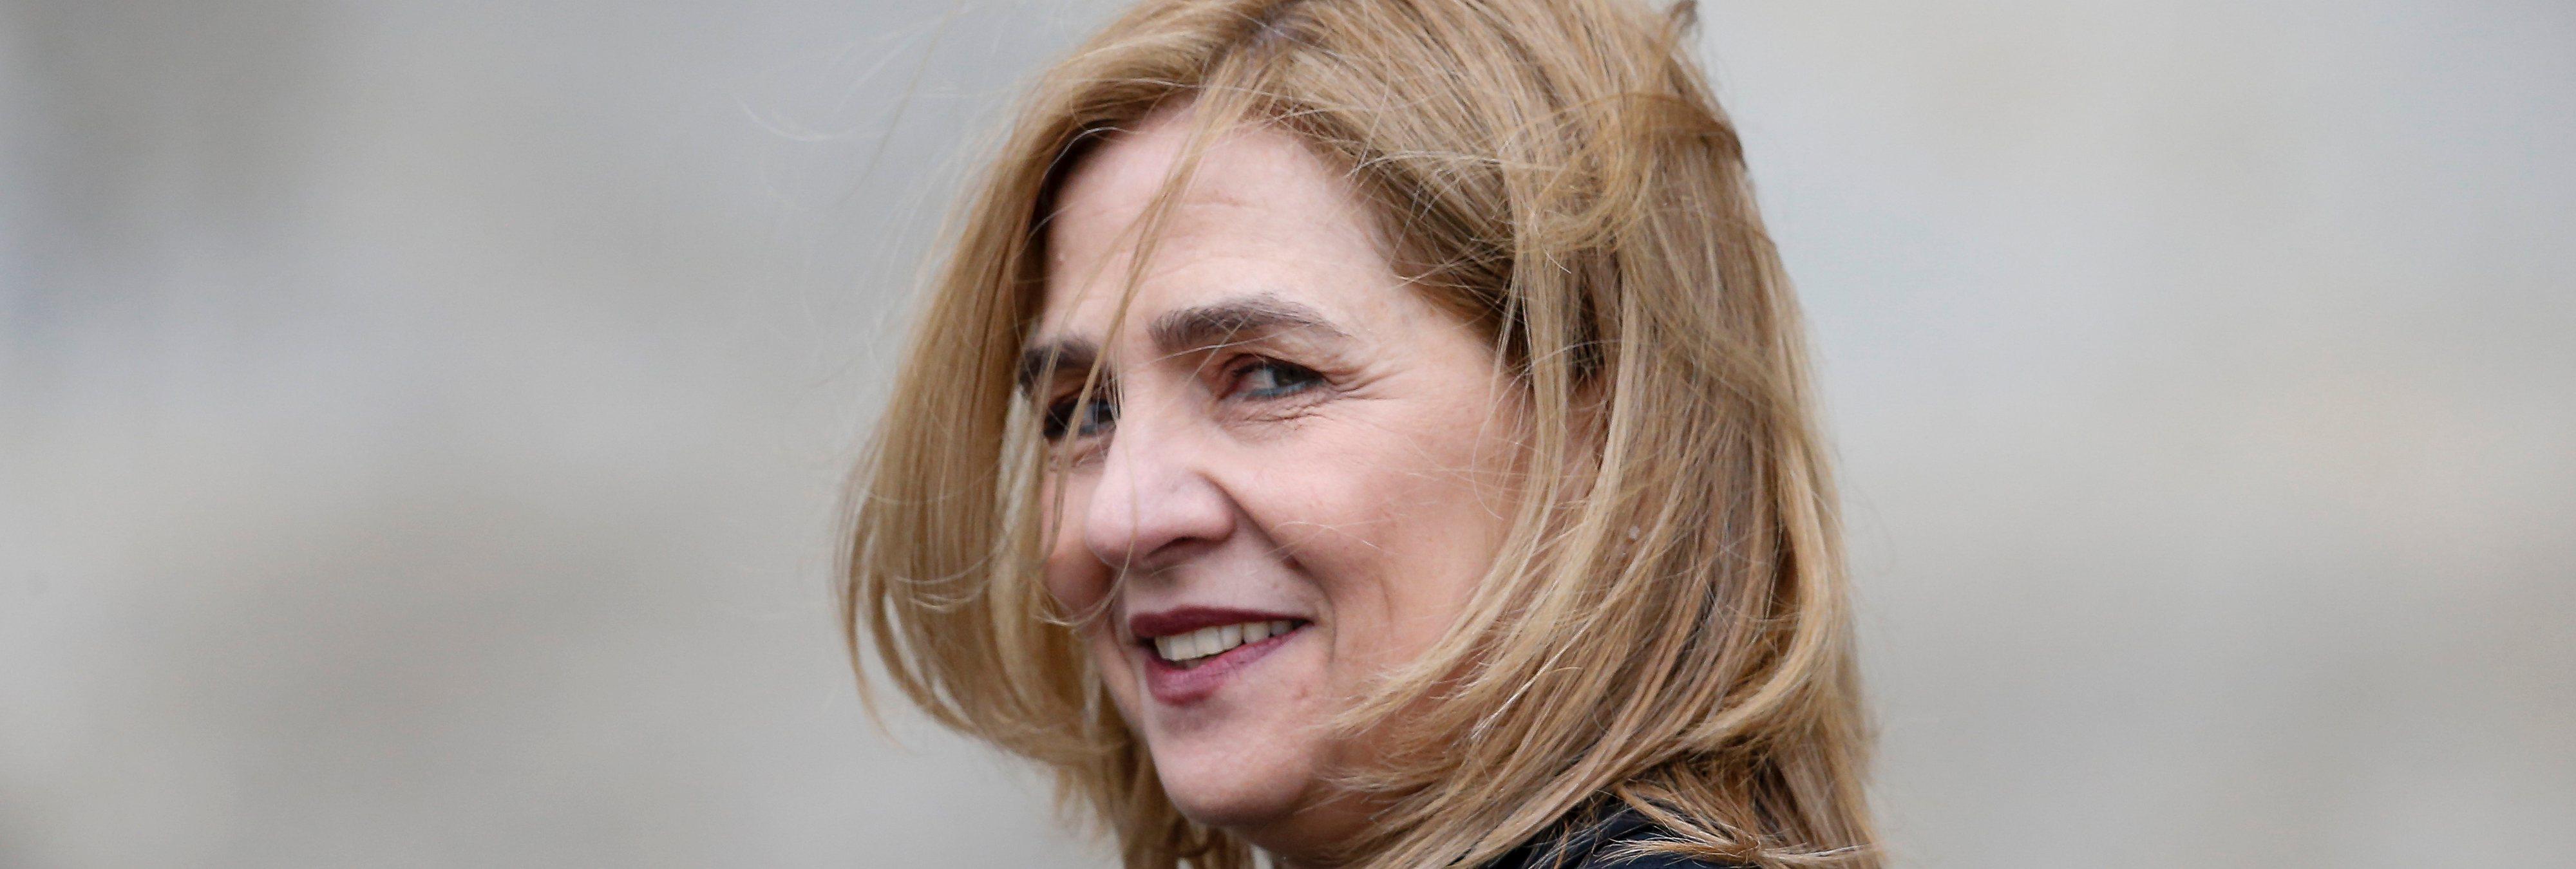 La infanta Cristina recibe los 322.000 euros de fianza del caso Nóos